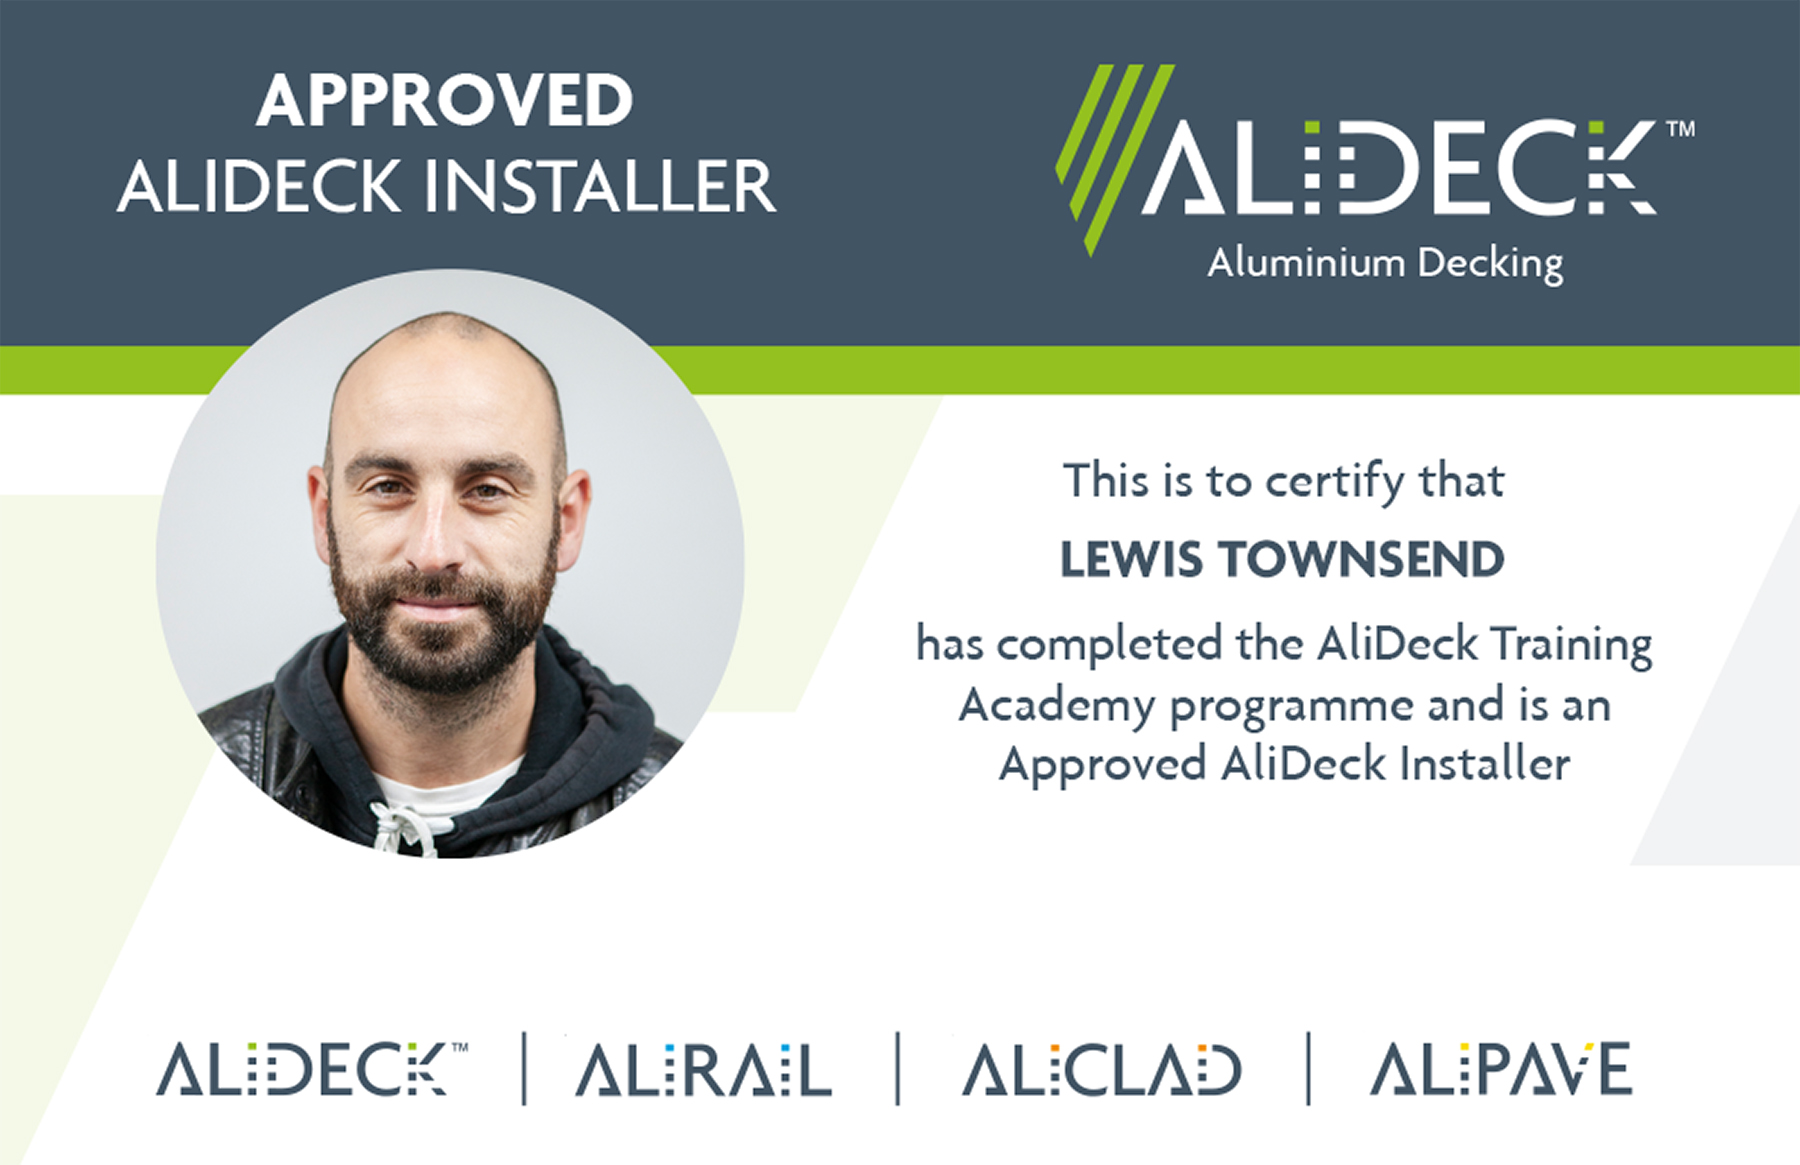 AliDeck Aluminium Decking Installation Training Cards